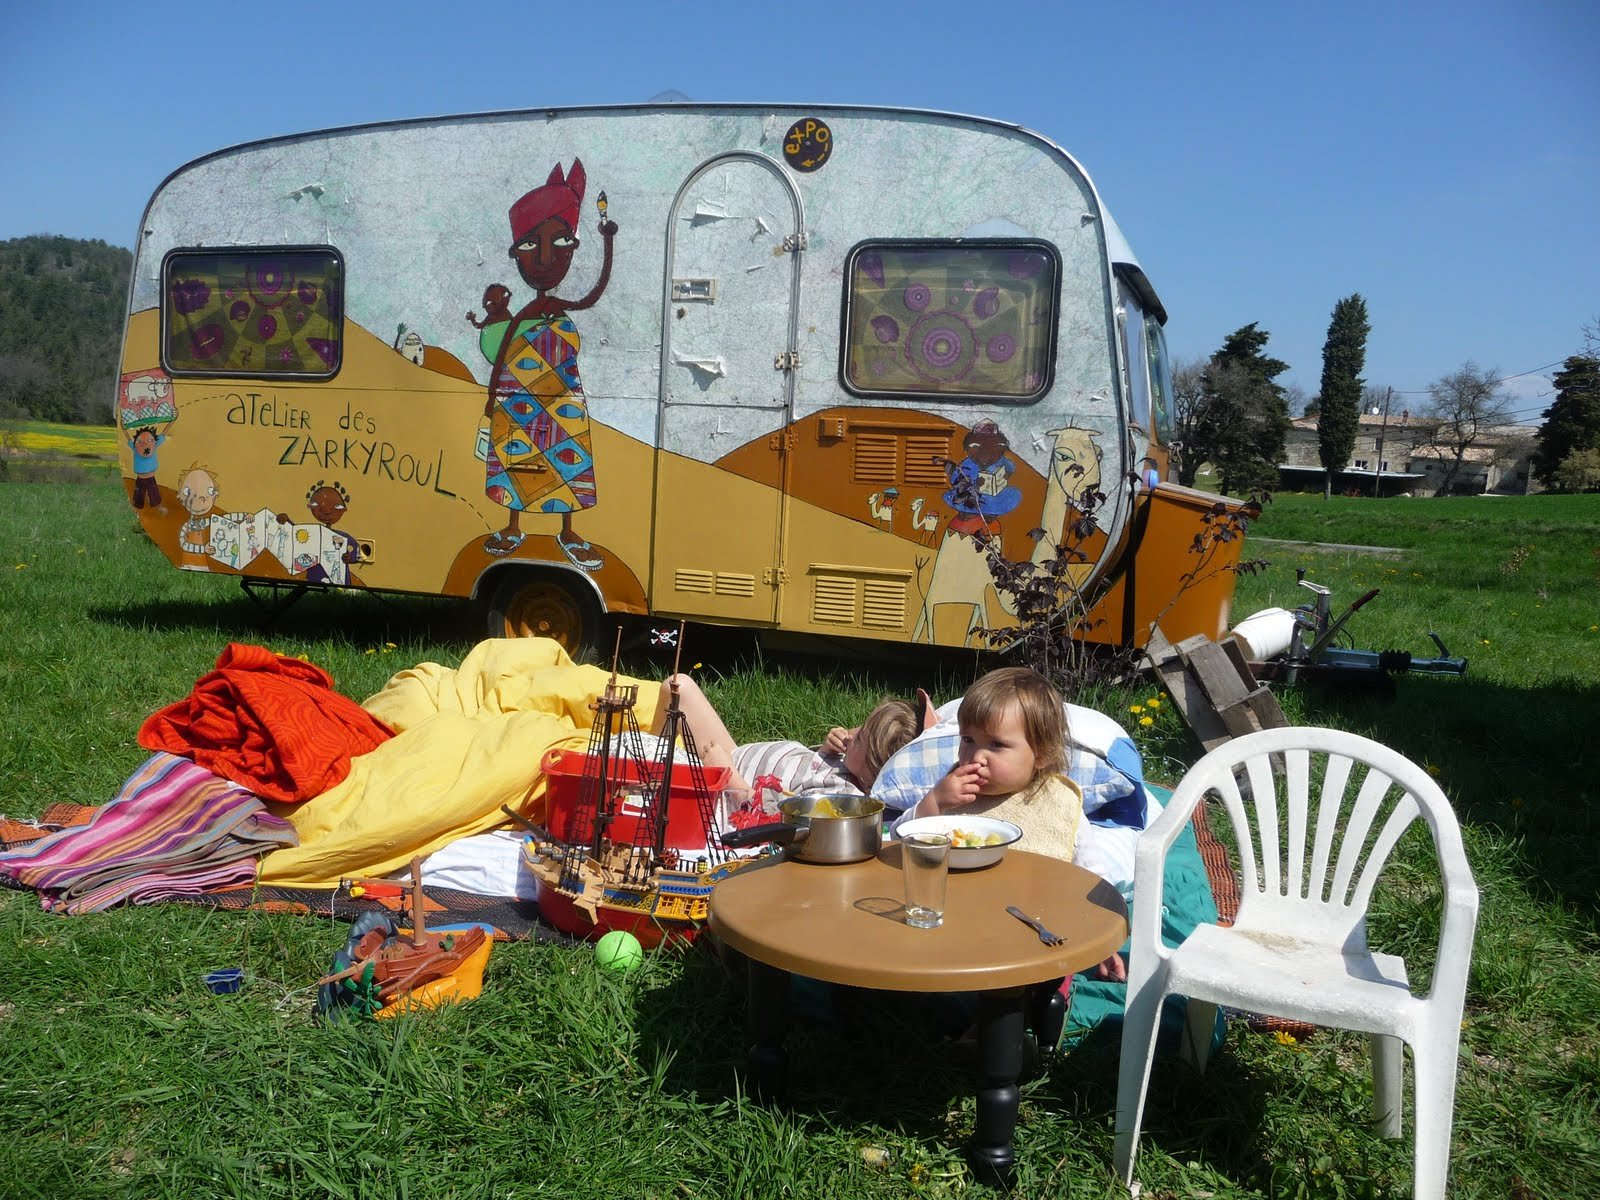 ATELIER DES ZARKYROUL: Restauration de la caravane en famille!